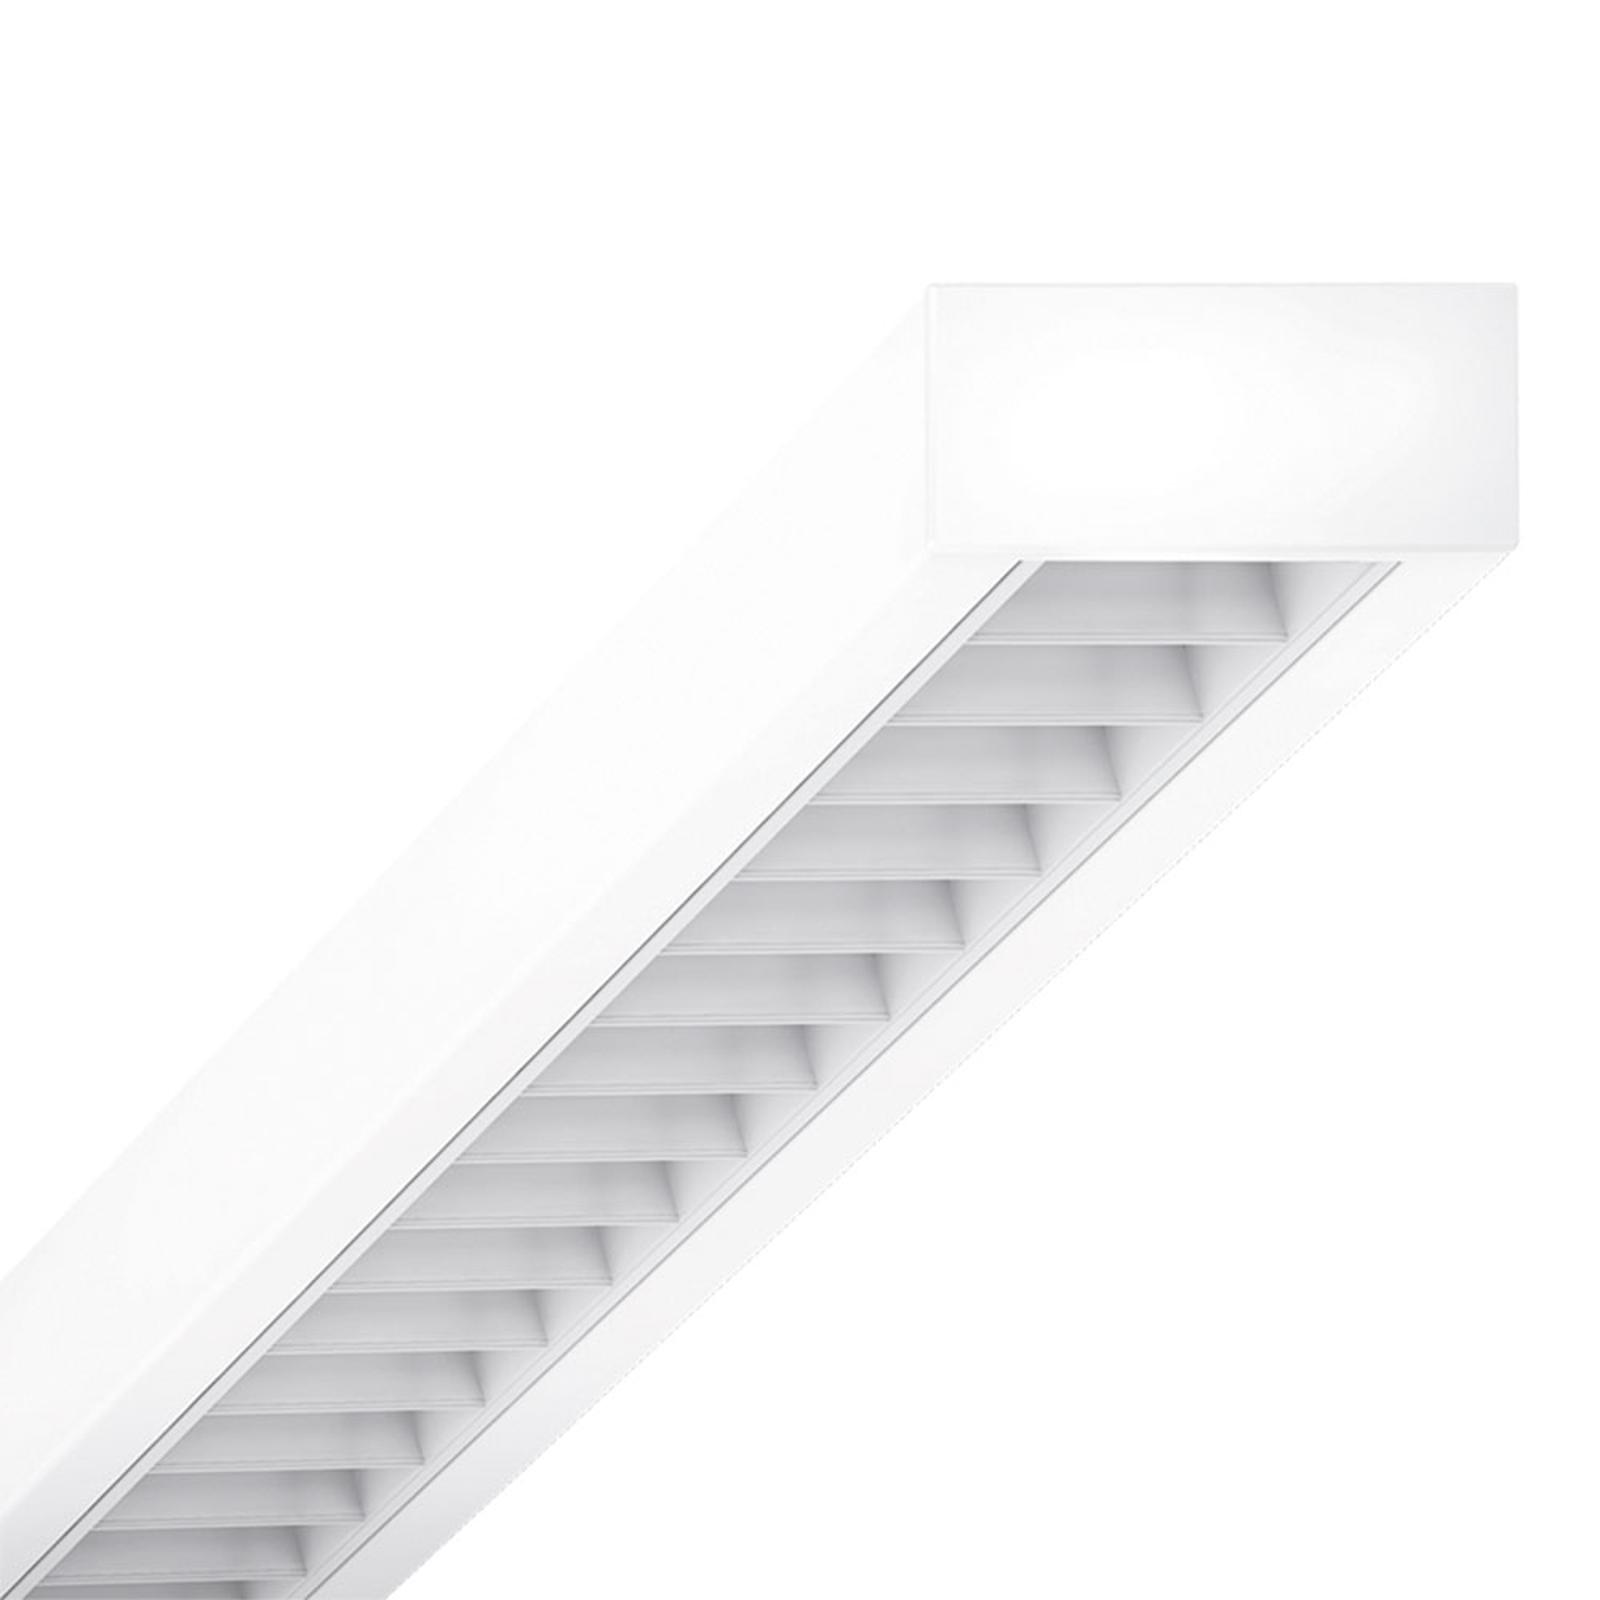 Lampa sufitowa LED cubus-RSAXC-1500 4000K raster